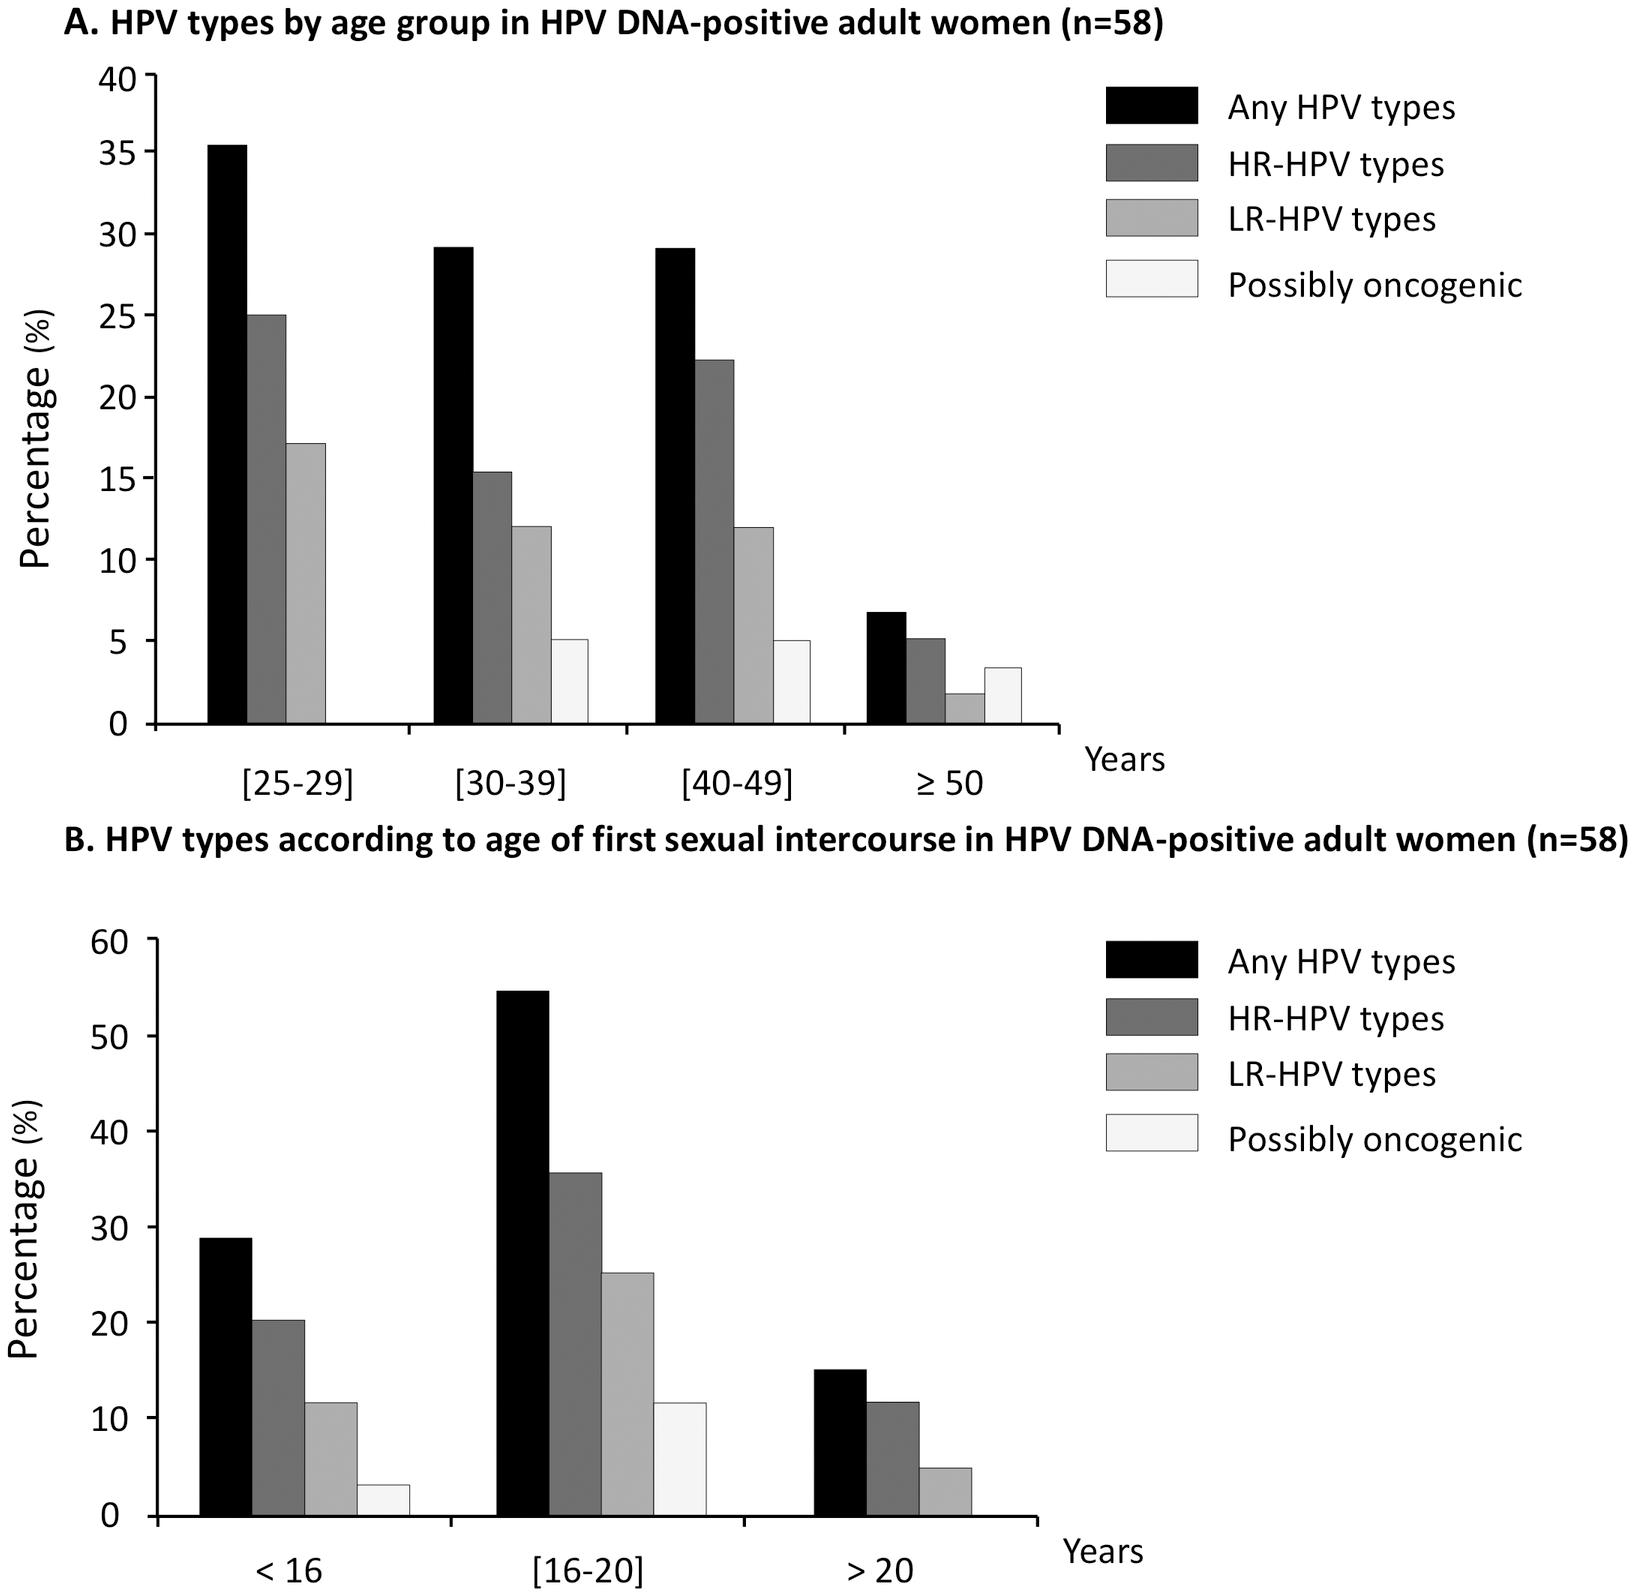 hpv high low risk qiagen la gi respiratory papillomatosis diagnosis